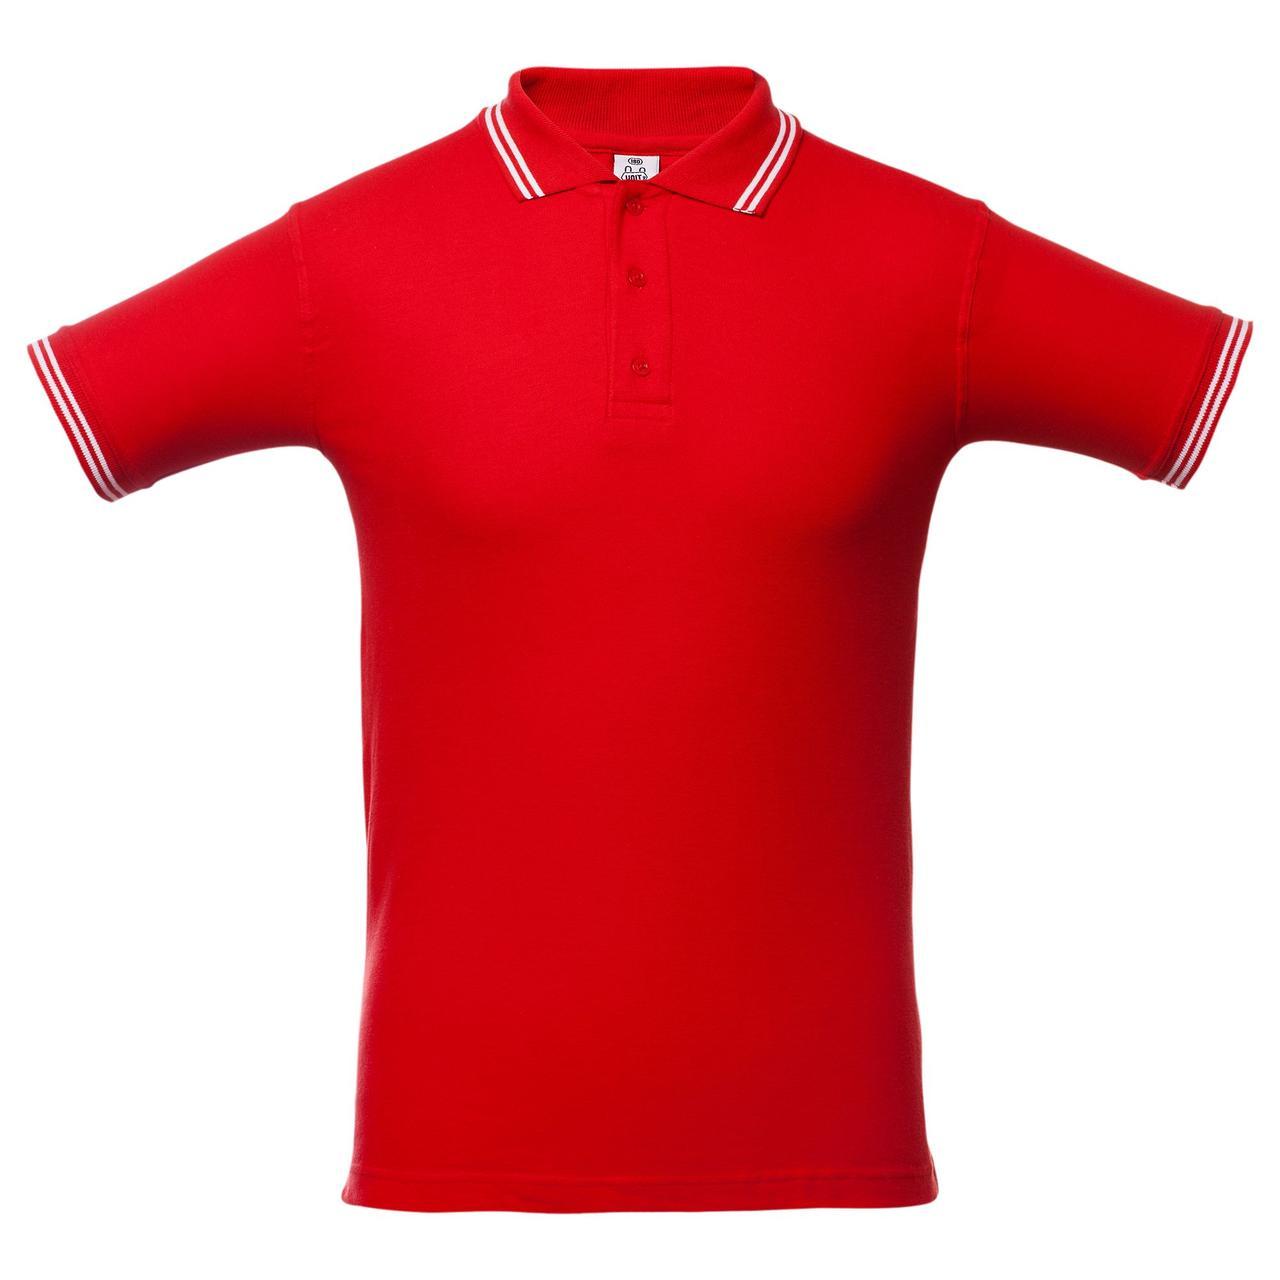 Рубашка поло Virma Stripes, красная (артикул 1253.50)